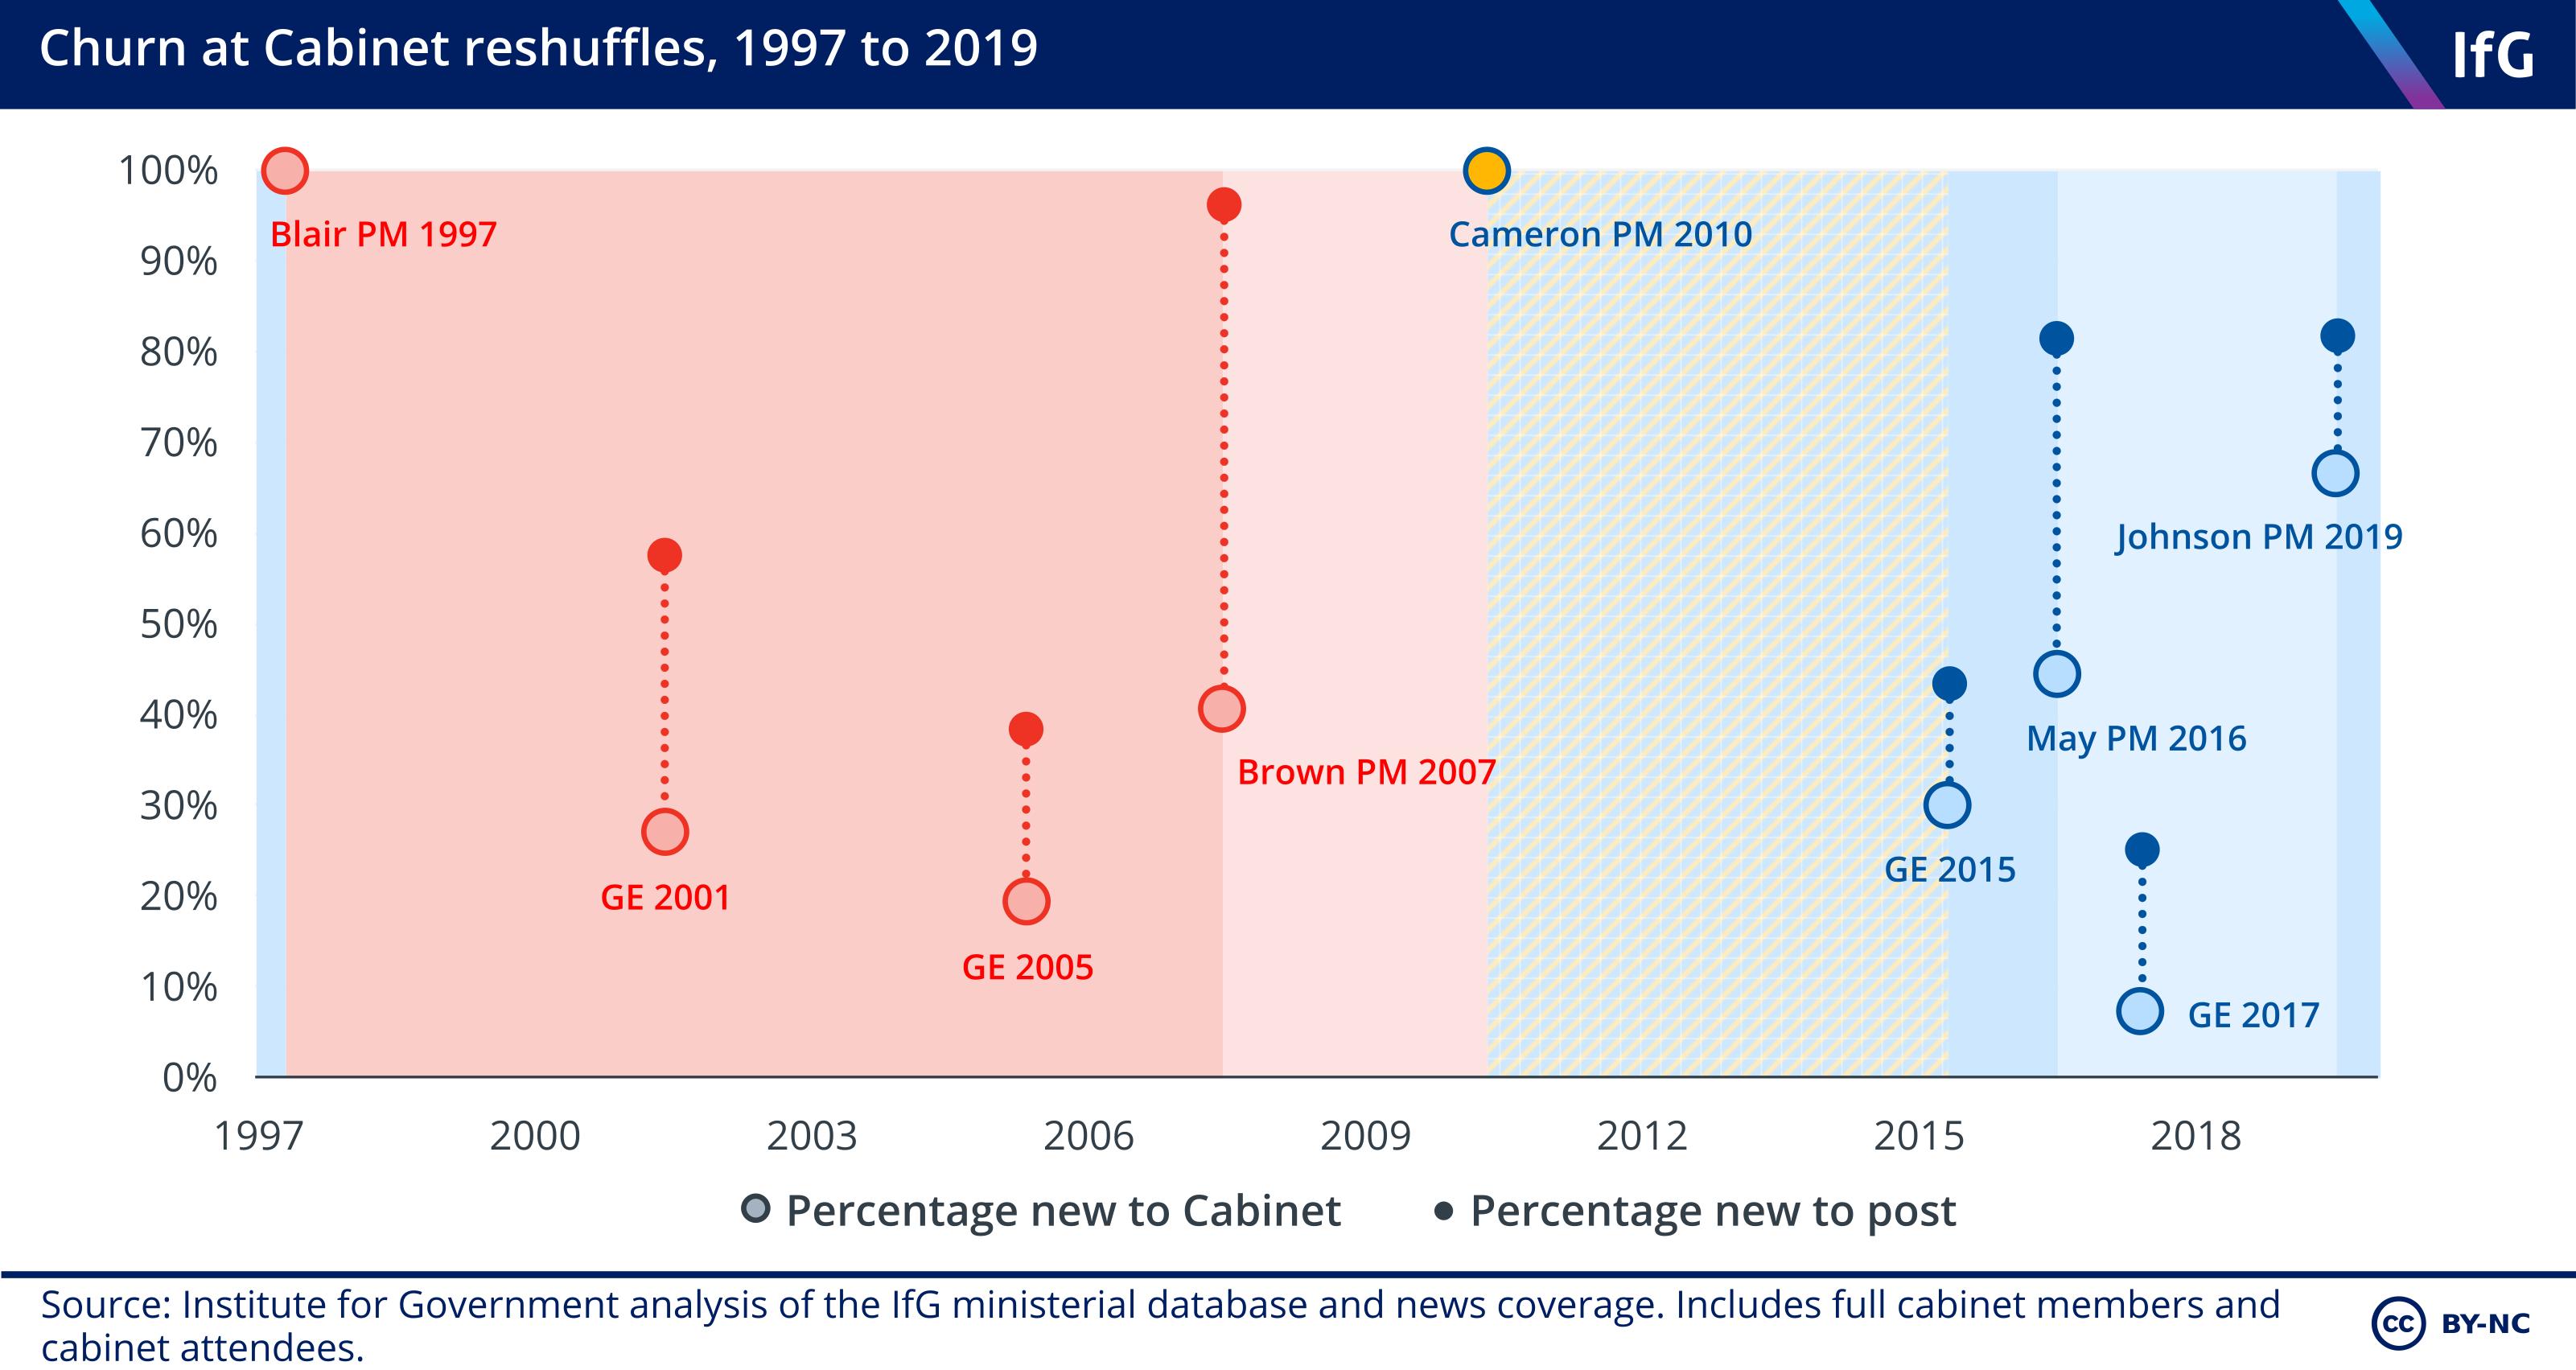 Churn at Cabinet reshuffles - 1997 to 2019